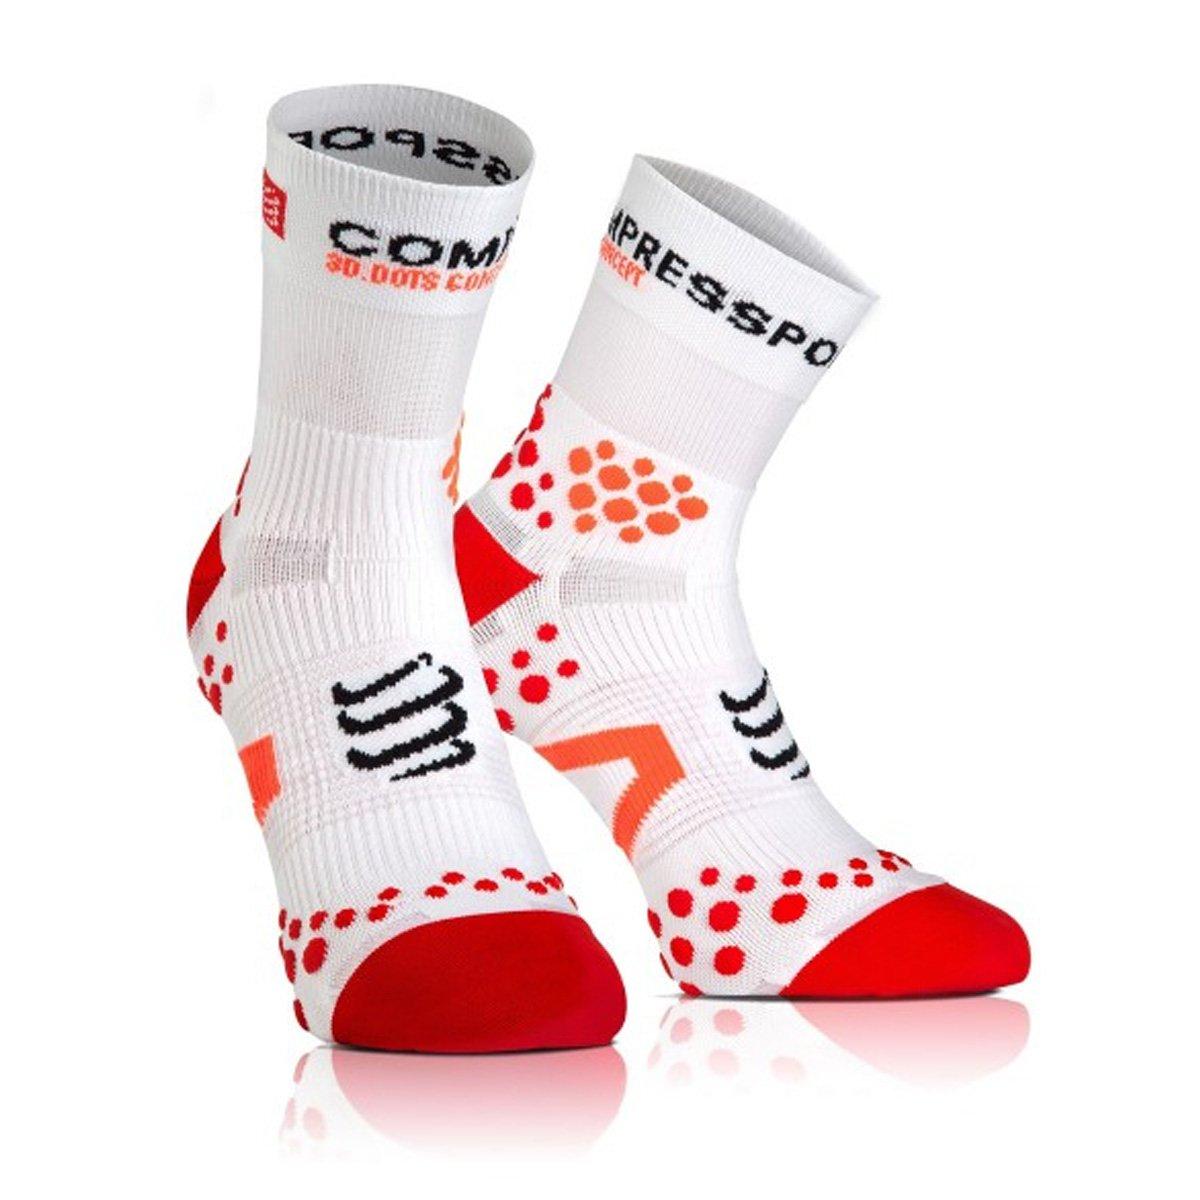 COMPRESSPORT Pro Racing V2.1 Run High Socks 2015